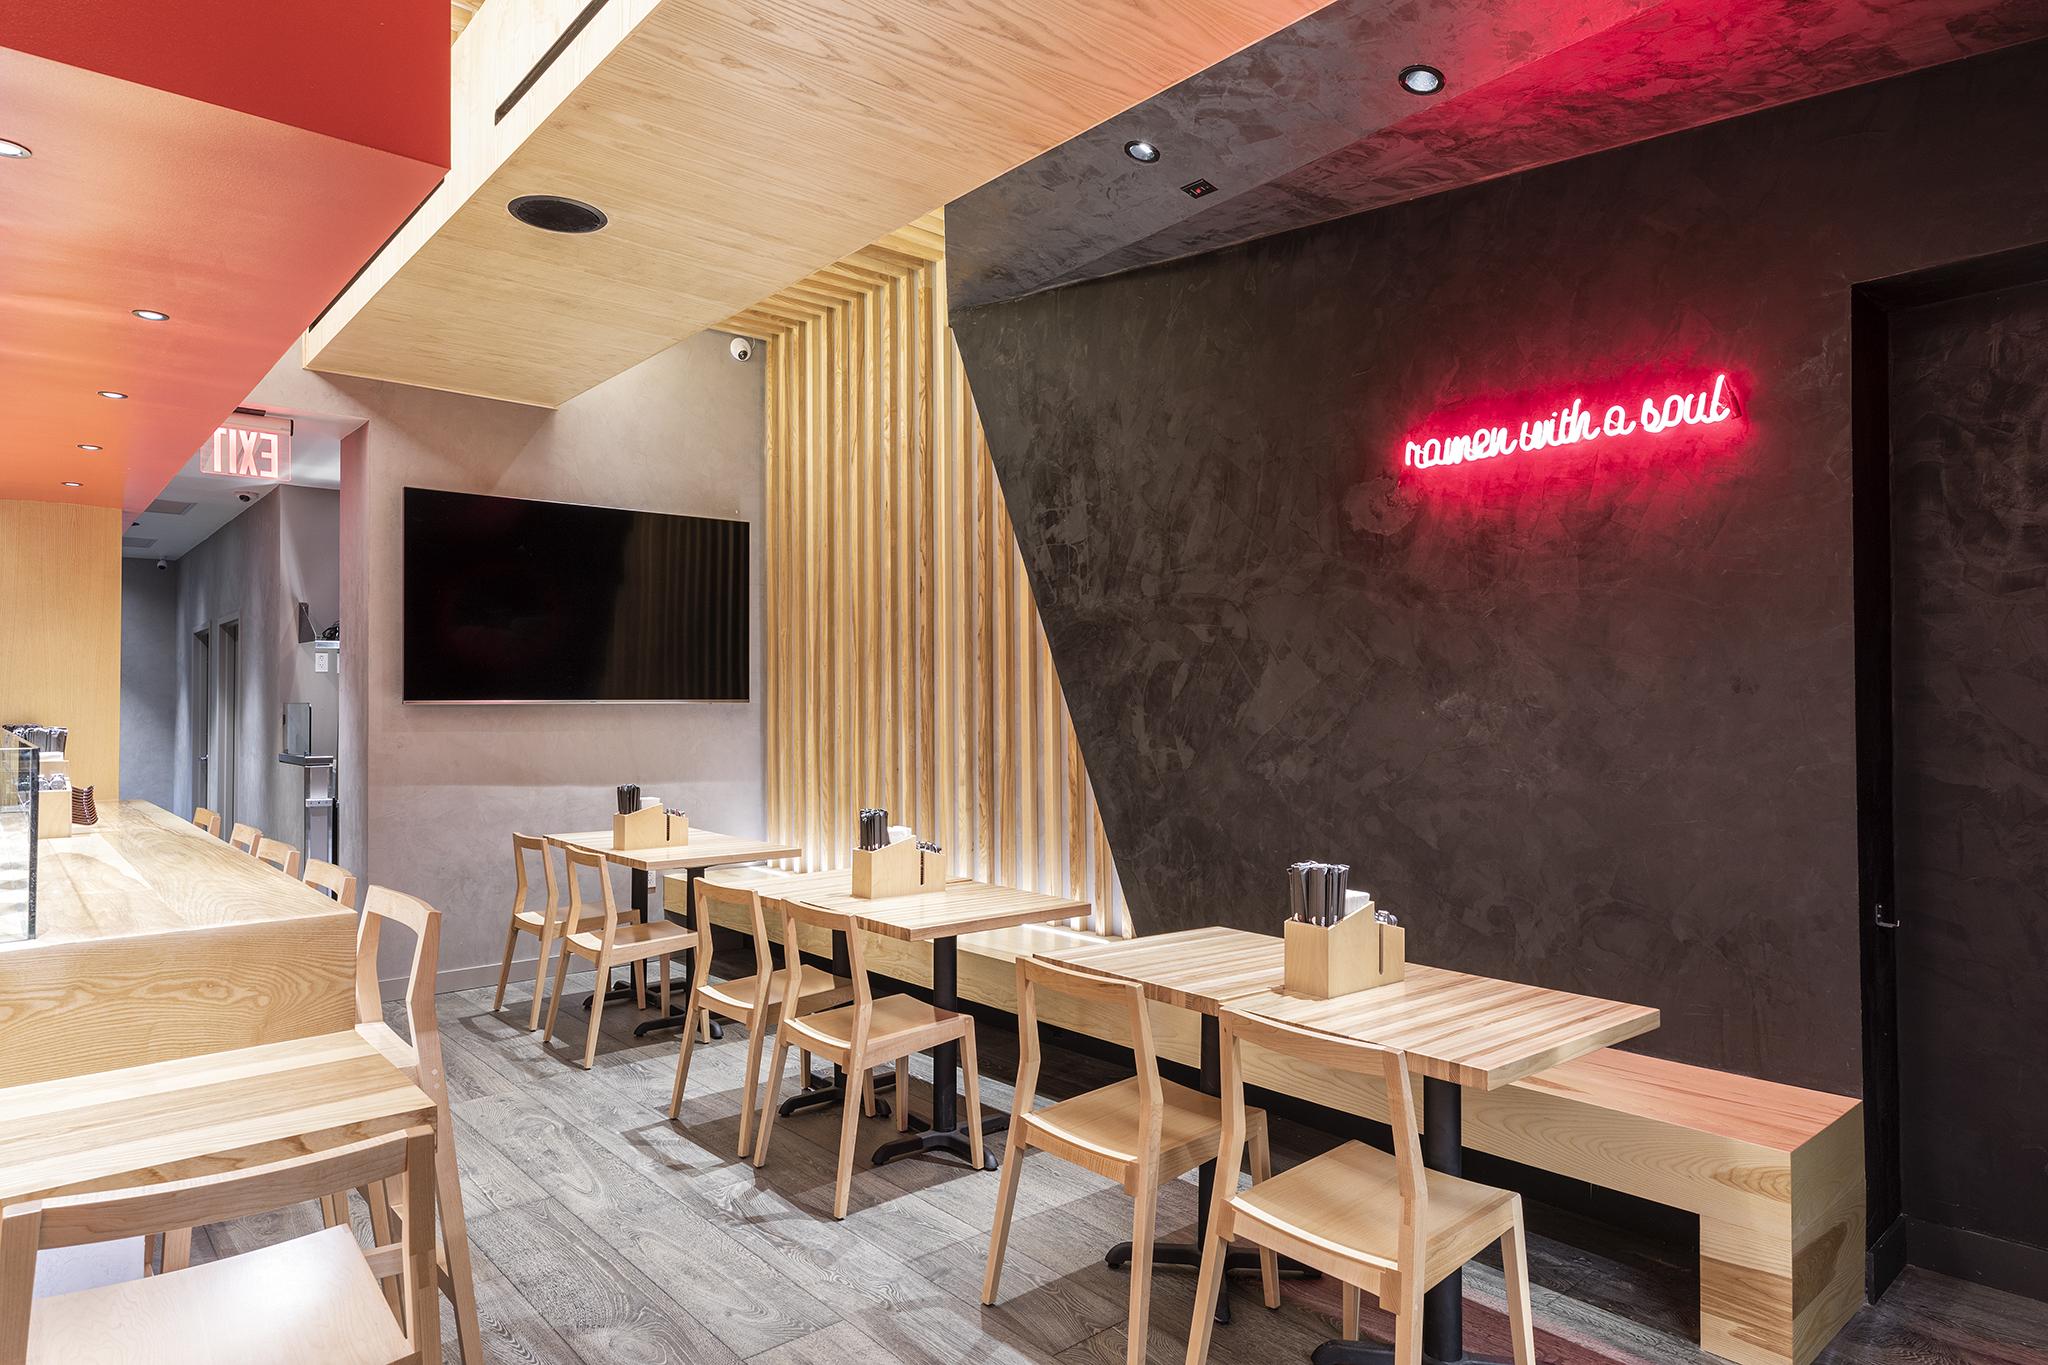 Tatsu Ramen in Lower Manhattan / design by Studio Unltd